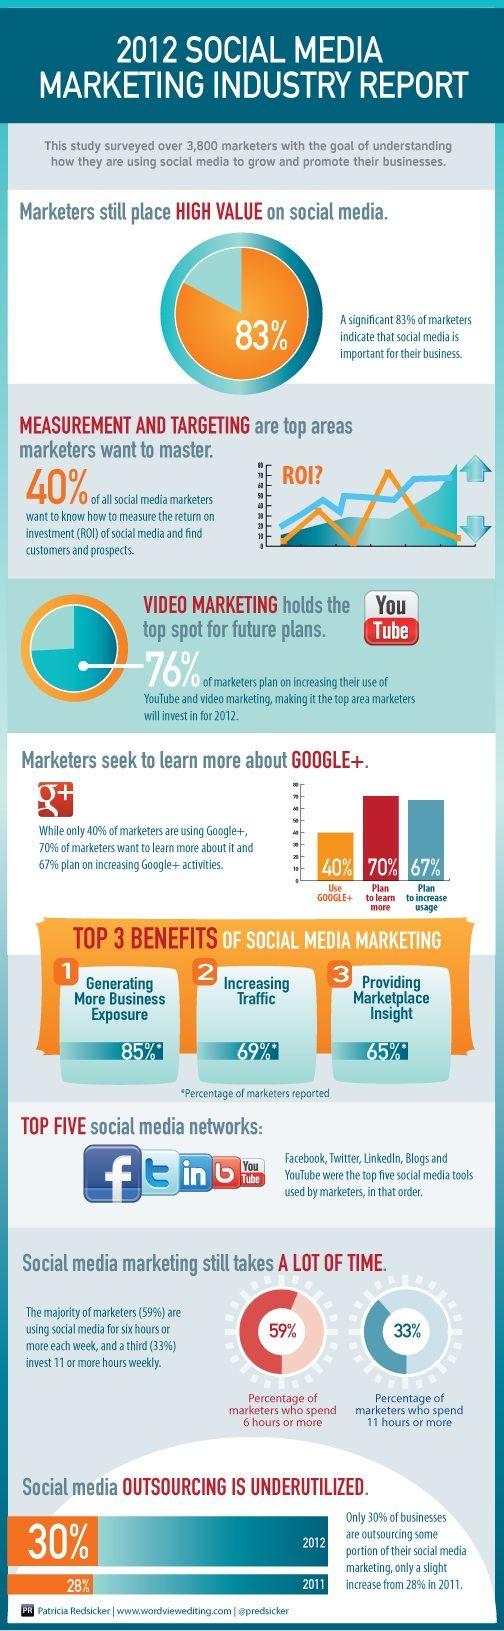 2012 Social Media Marketing Industry Report #infographics    Source: wordviewediting.com